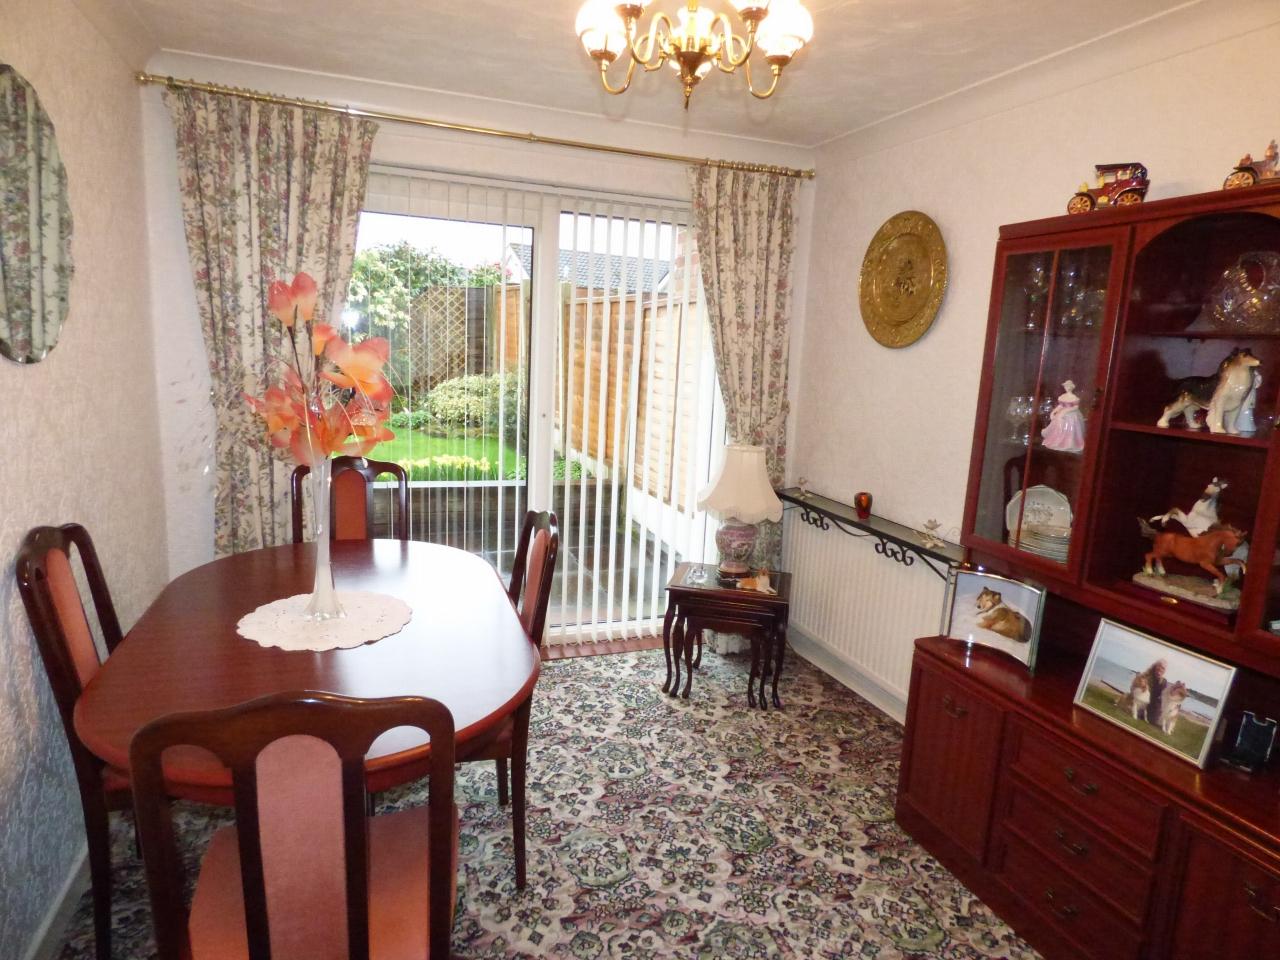 3 Bedroom Semi-detached House For Sale - Image 3